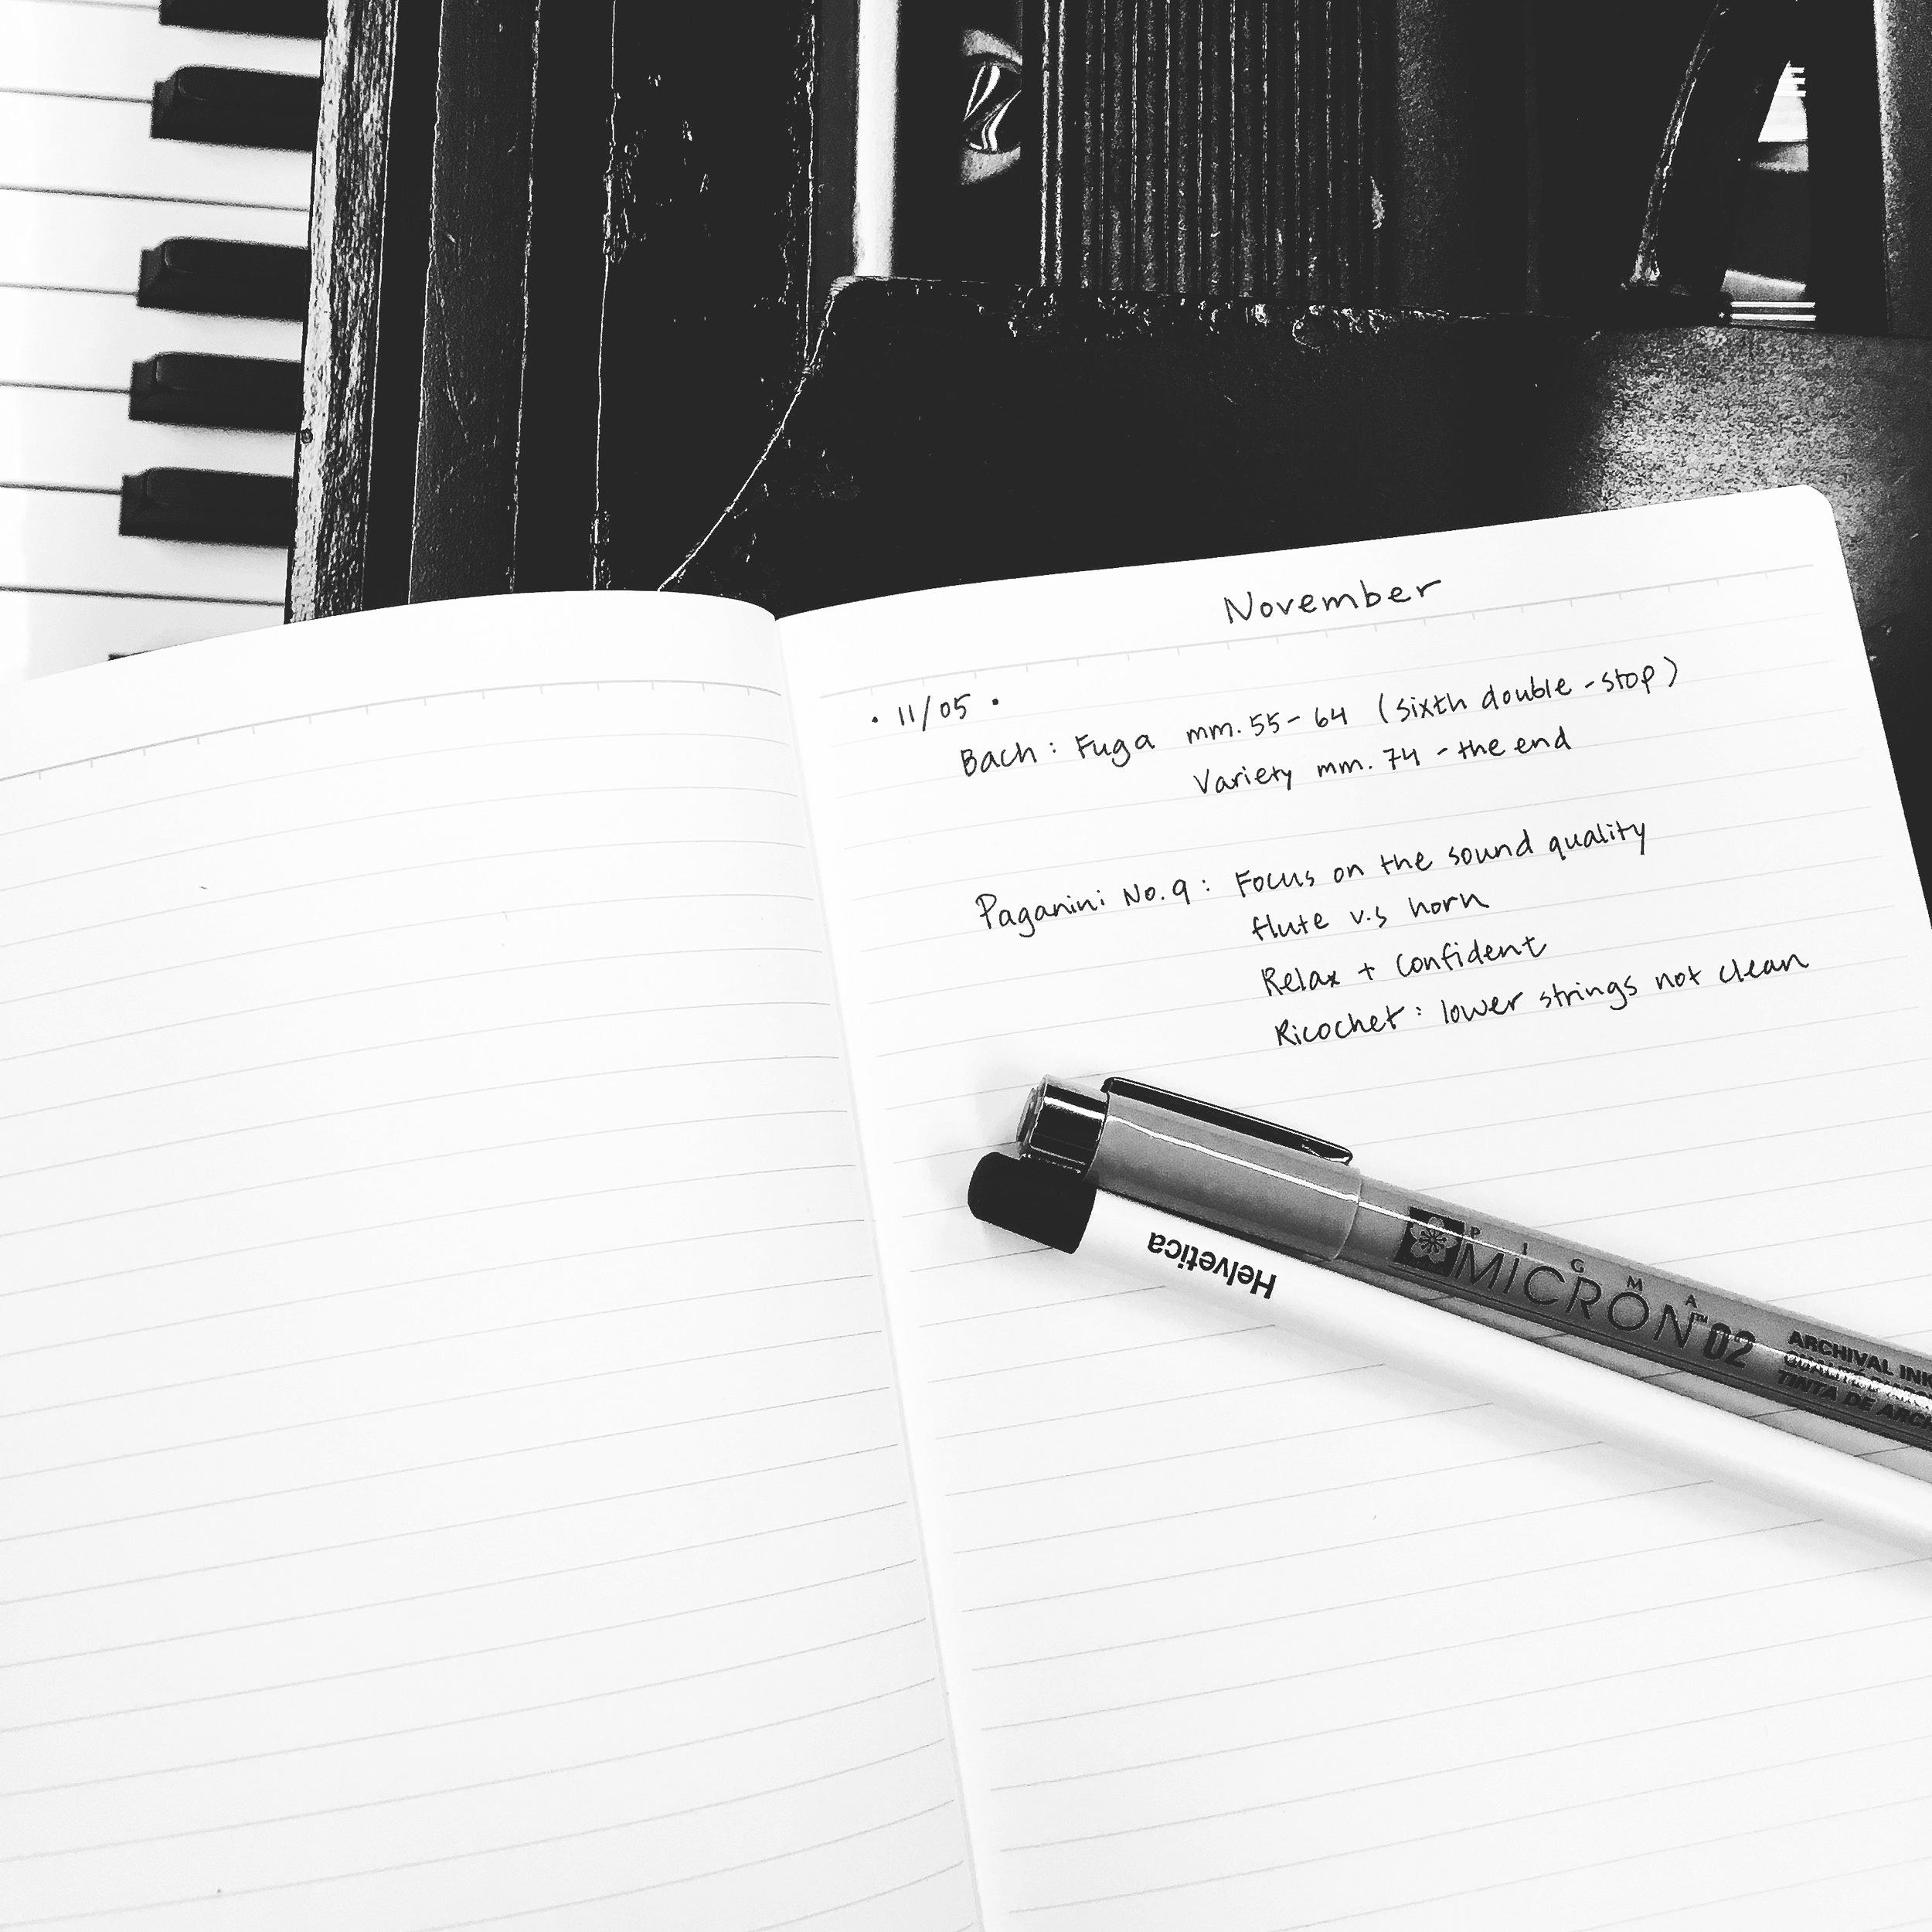 My current practice journal